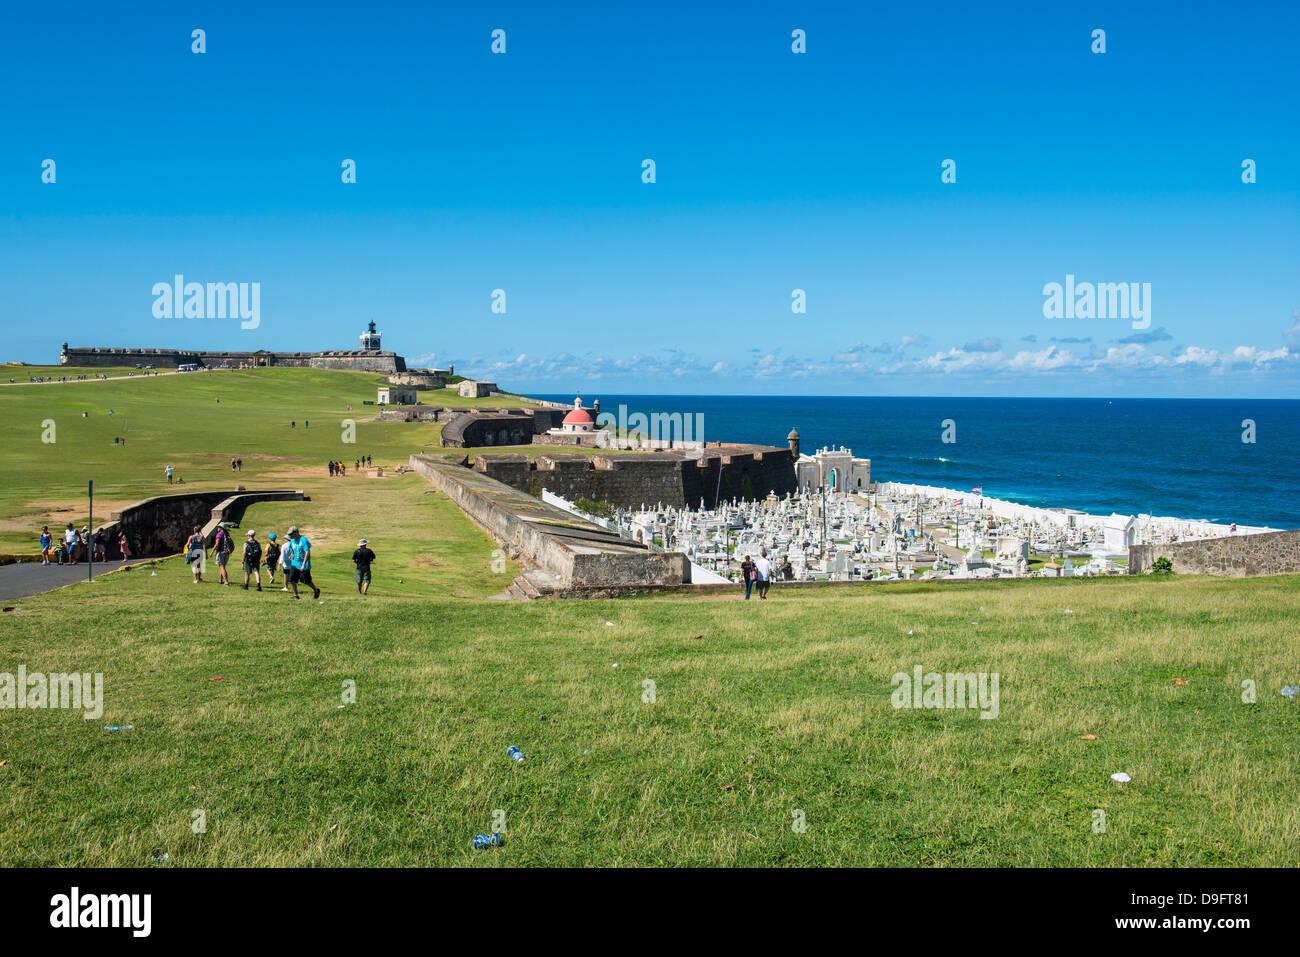 San Felipe del Morro, UNESCO World Heritage Site, San Juan Historic Site, Puerto Rico, Caribbean - Stock Image